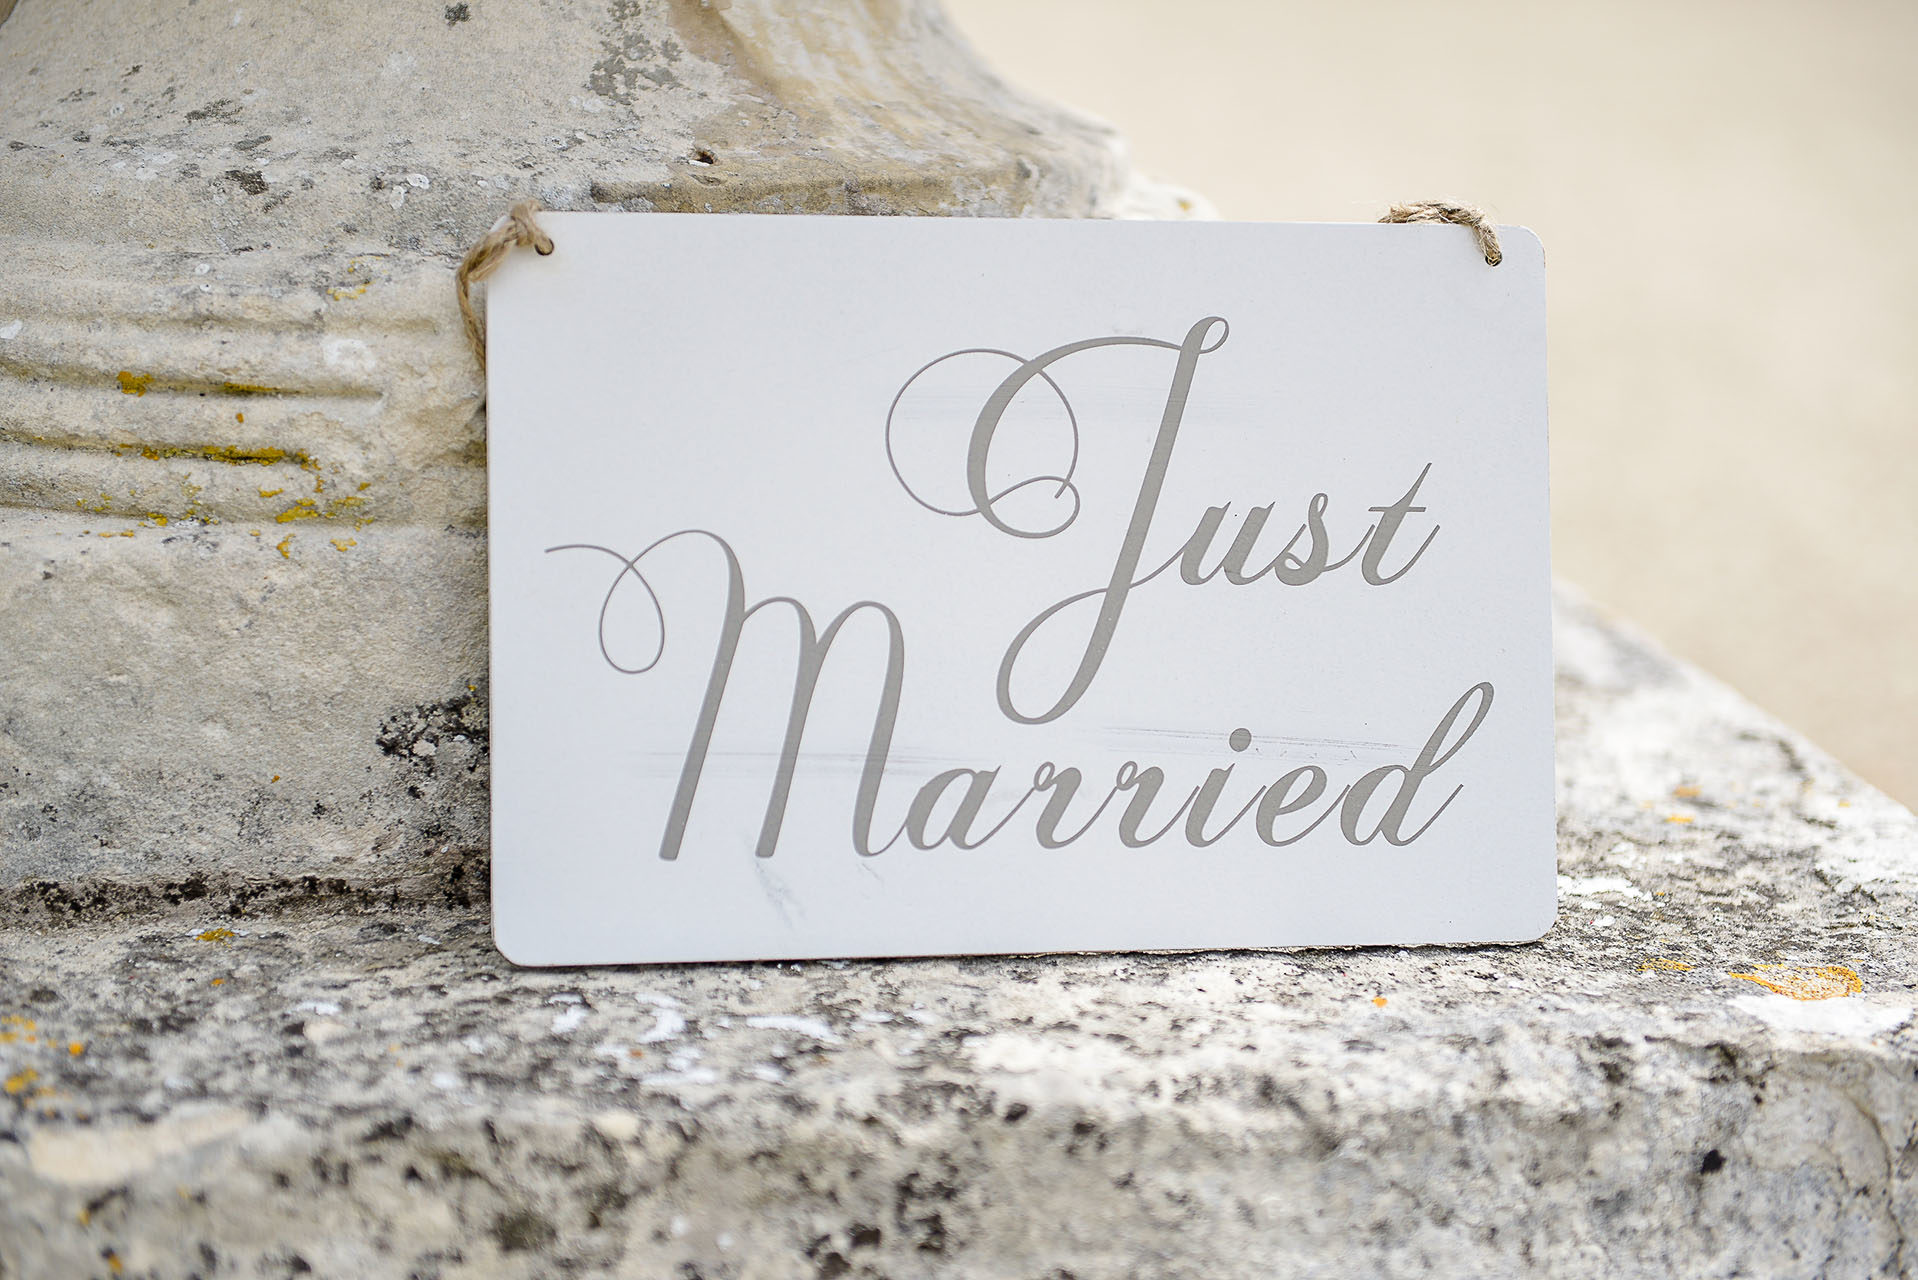 maya-angelsen-photographe-mariage-ile-de-france-seine-saint-denis